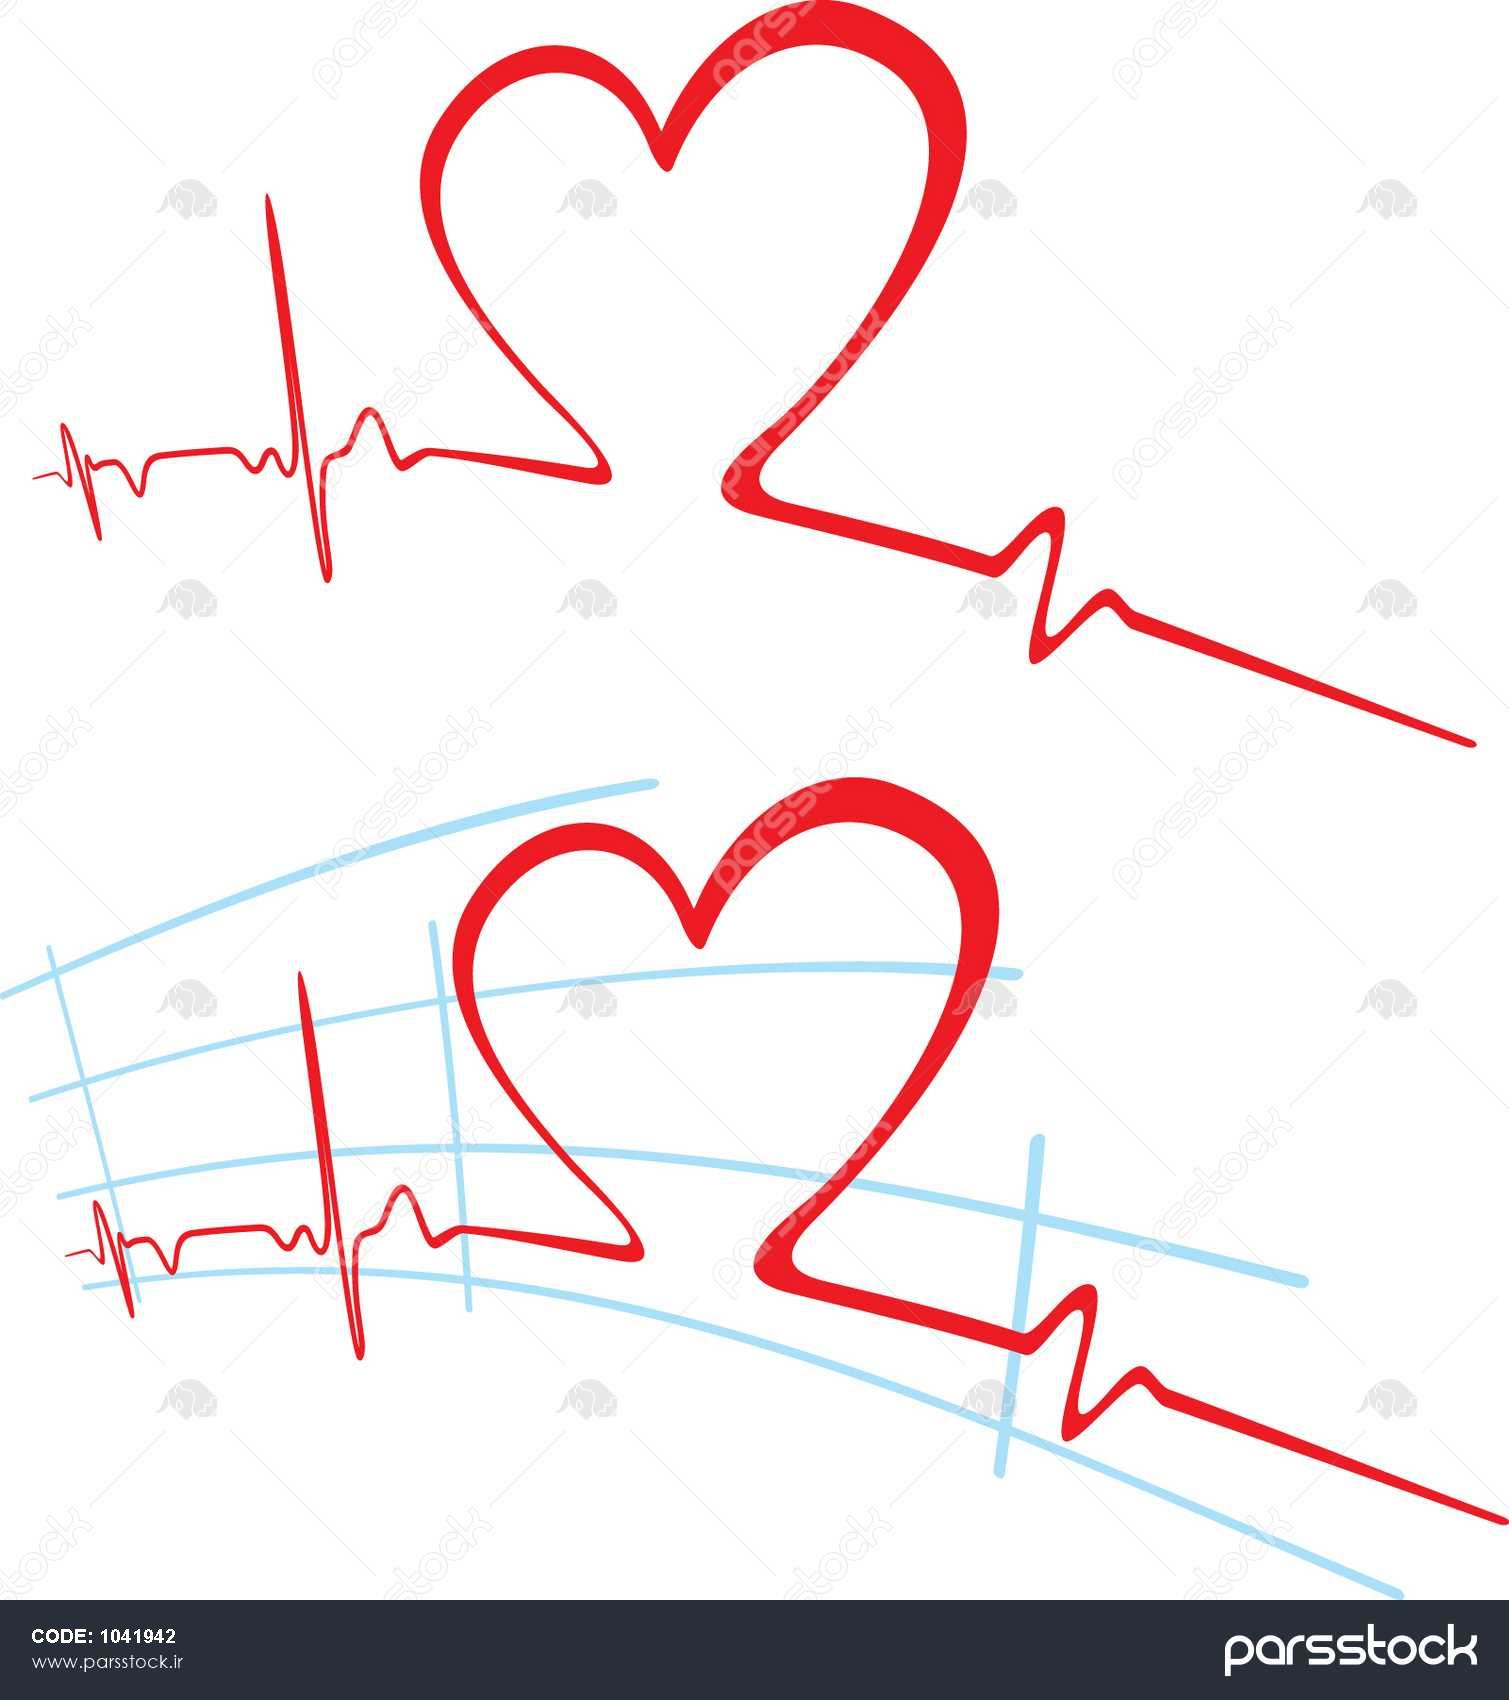 Cardiogram ضربان قلب وکتور لایه باز 1041942 پارس استاک شاتر استوک پارسی